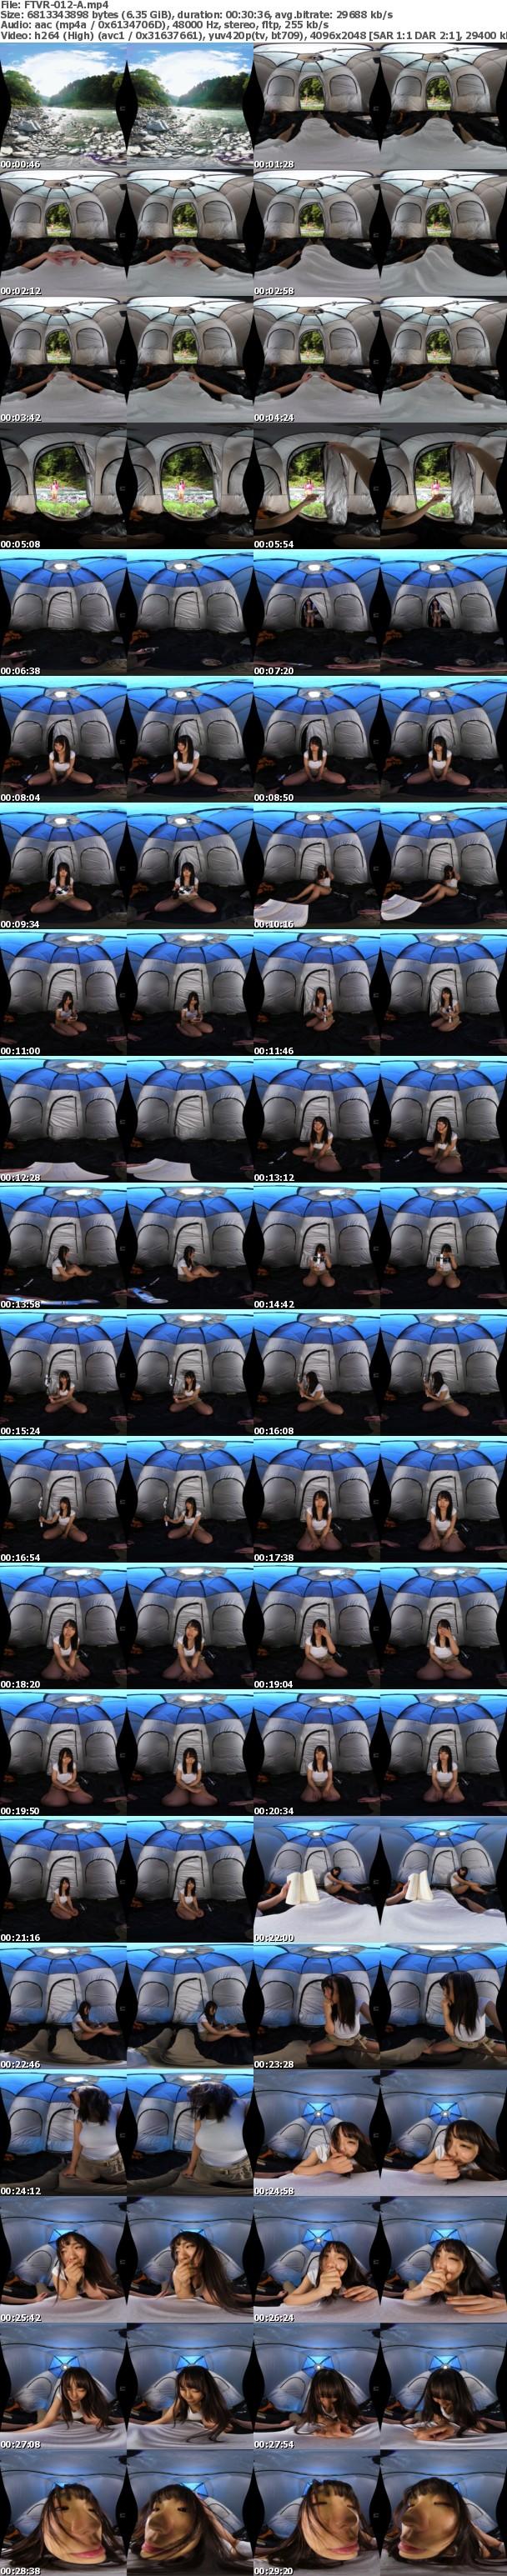 (VR) FTVR-012 パニック・ソロキャンプ ノーブラ巨乳Y●u Tuberが熊に追われて俺のテントに転がり込んできた!!恐怖で乳首がピン勃ちのまま「助けて!」と俺にしがみついてくる! 「チャンネル登録者にはぜっっったいにナイショですよ」 稲場るか